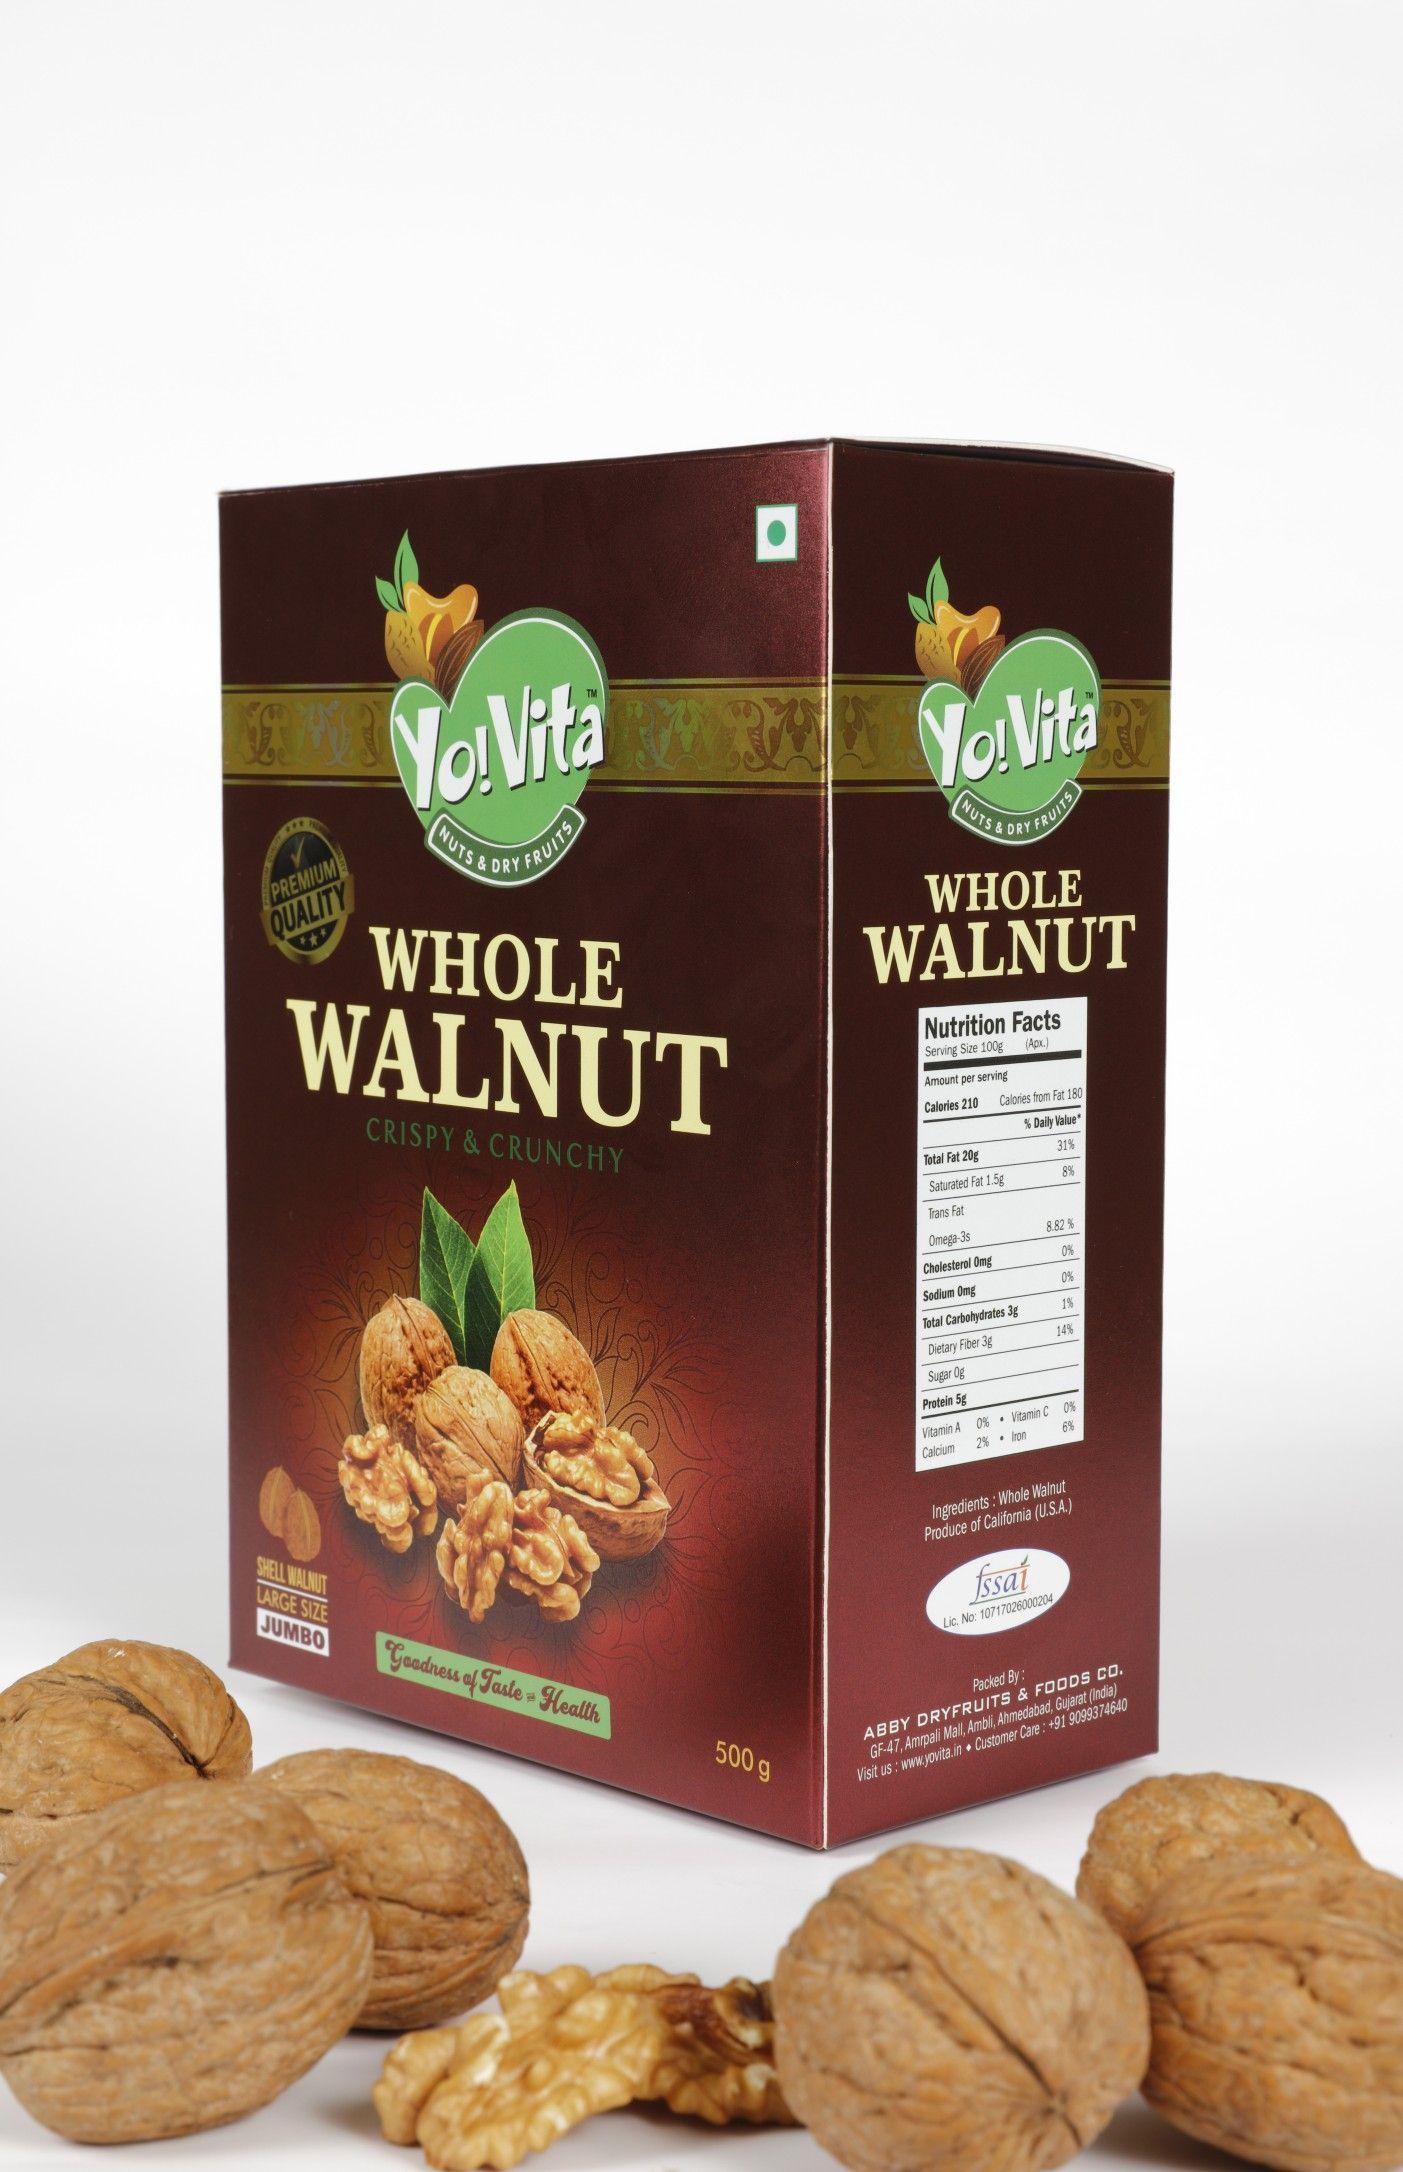 #walnut #health #fit #california #dryfruitbox #walnuts #body #daily #diet #dietplan #dietfood #nutrition #weightloss #fibre #brain #pinterest #brainhealth #nuts #skincare #taste #beauty #omega3 #protein #google #omega3s #antioxidants #calcium #antioxidant #zerocholesterol #iron #facebook #walnutsnutrition #walnut #health #fit #california #dryfruitbox #walnuts #body #daily #diet #dietplan #dietfood #nutrition #weightloss #fibre #brain #pinterest #brainhealth #nuts #skincare #taste #beauty #omega3 #walnutsnutrition